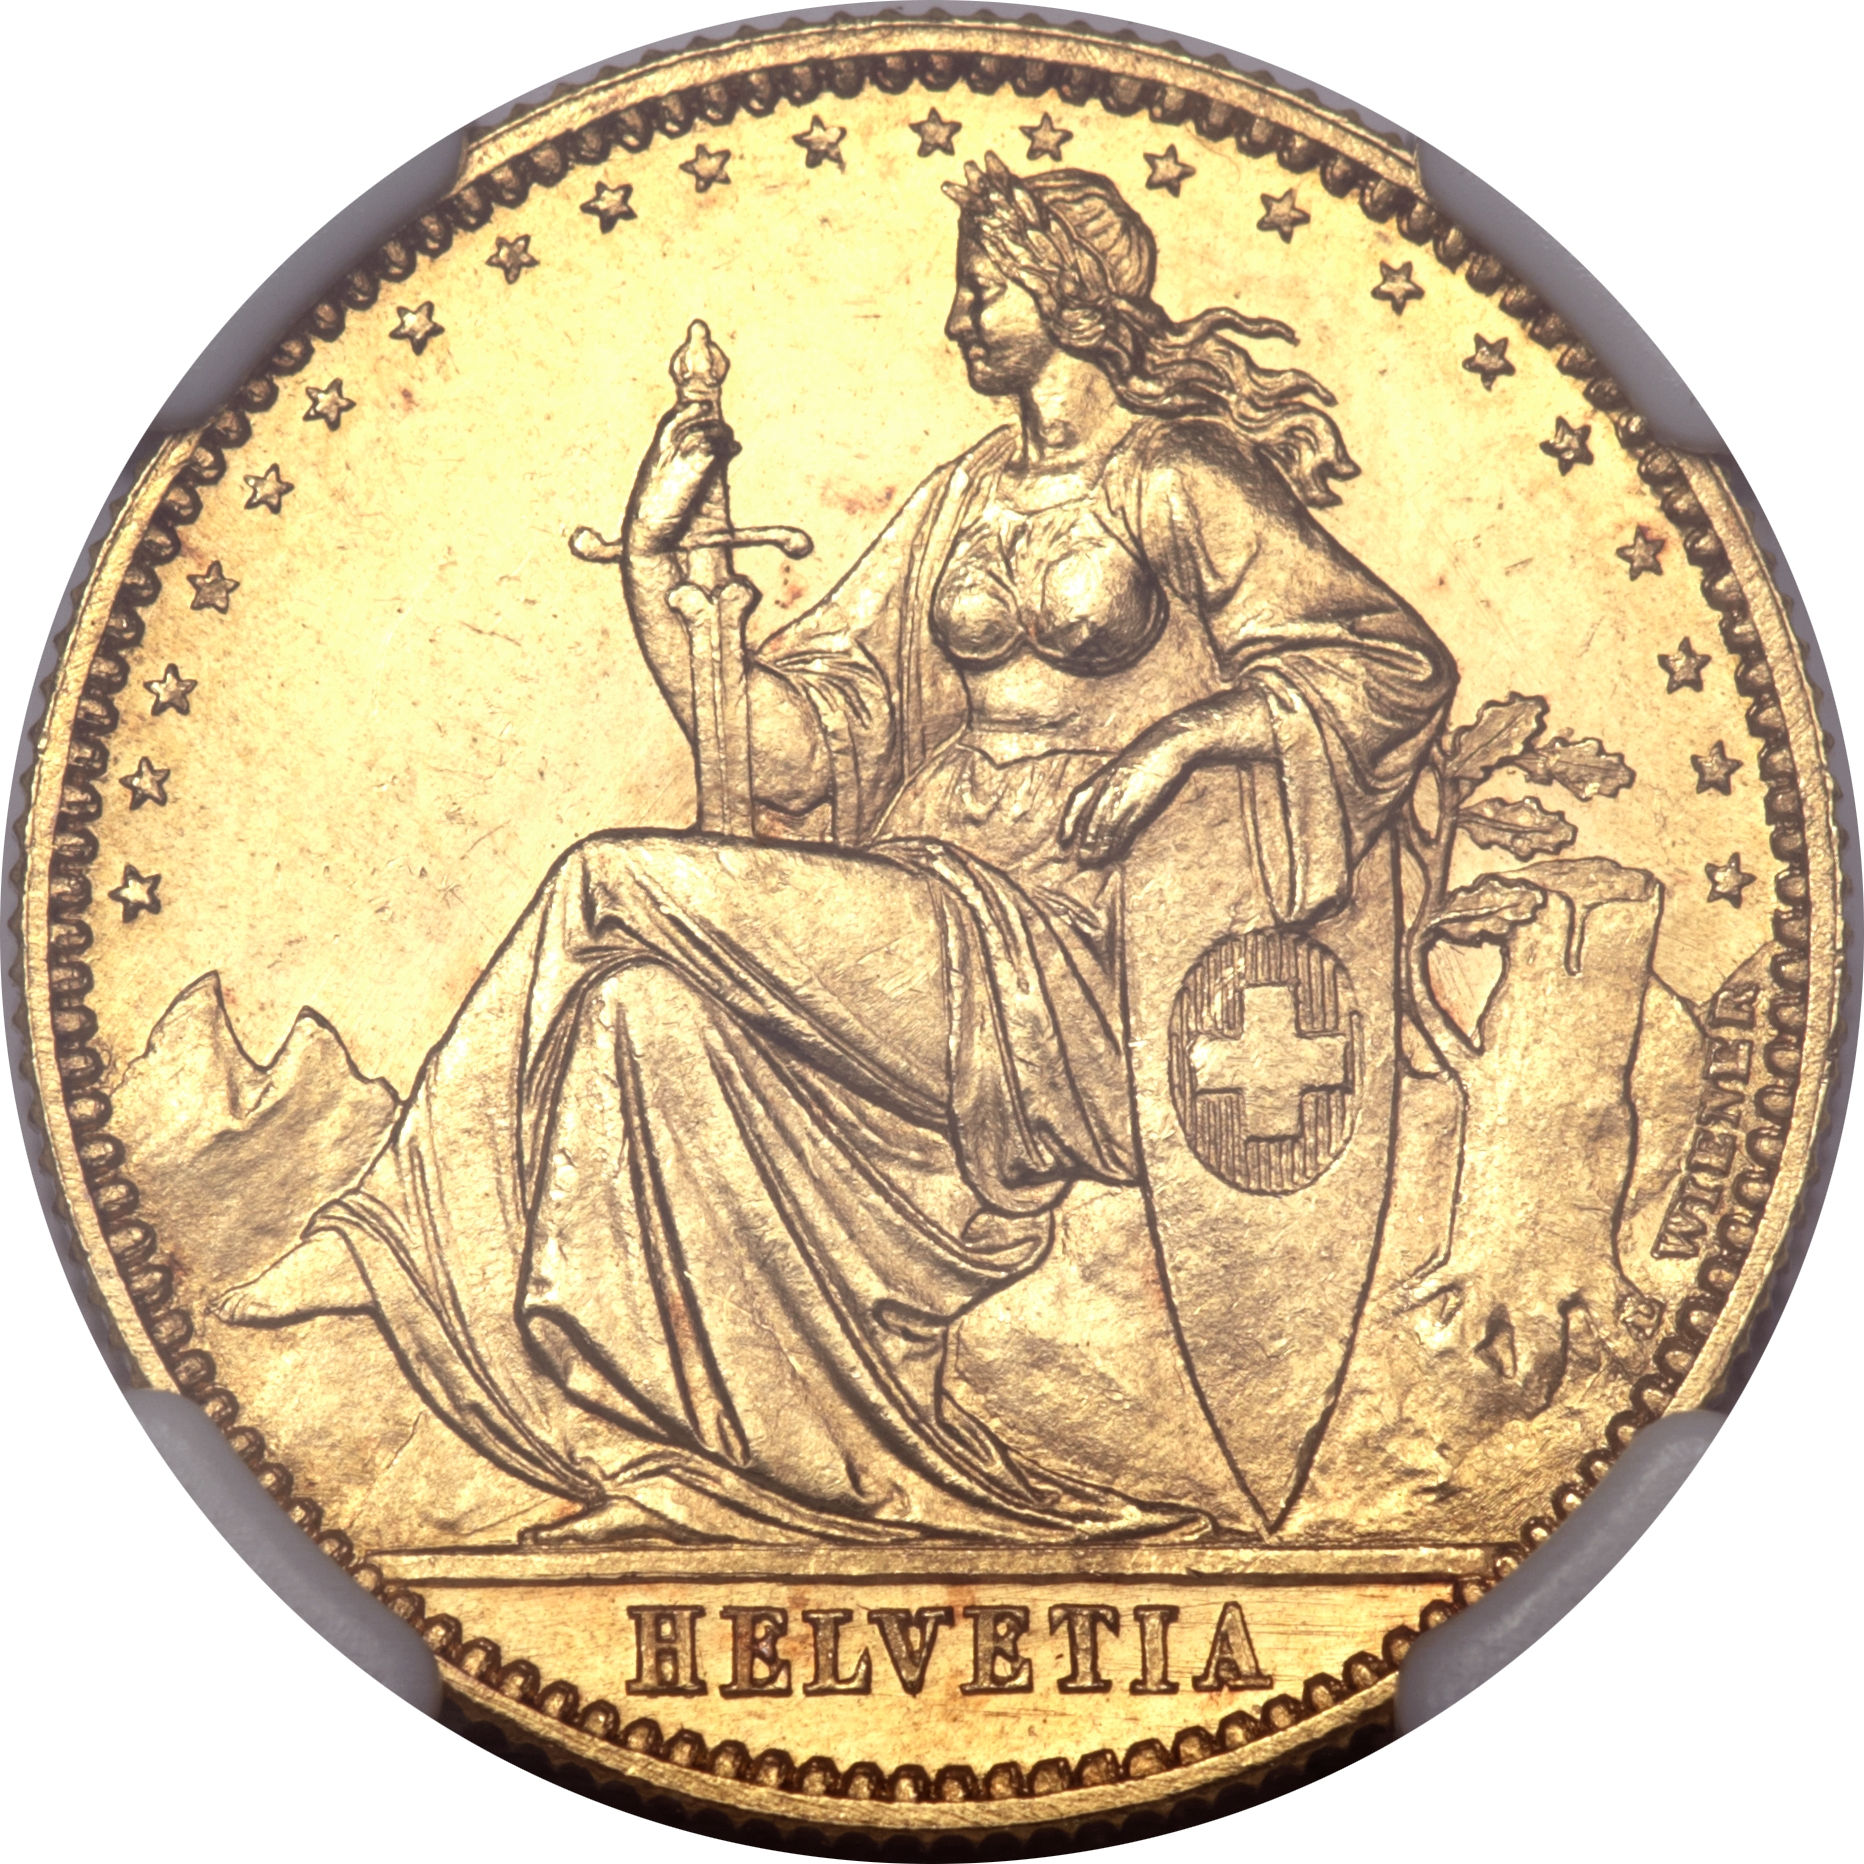 20 Francs (1873) Switzerland KM# Pn26 - CoinsBook